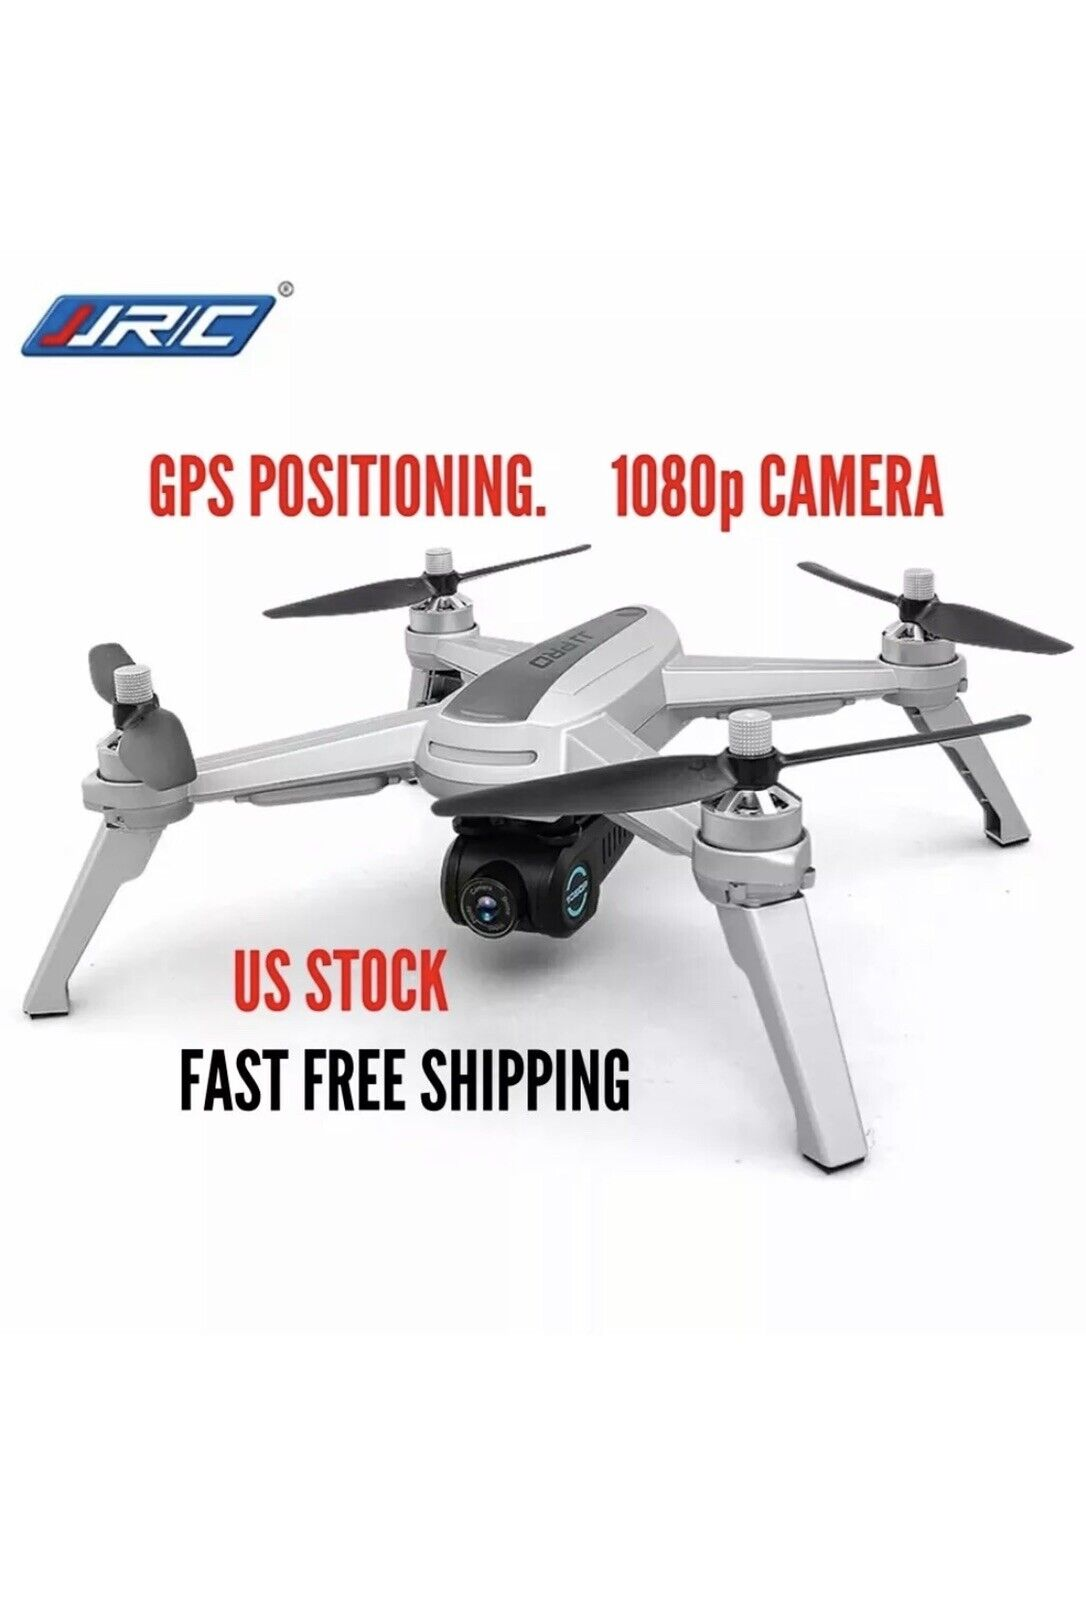 JJRC JJPRO X5 Esc 5G Wi-fi FPV quadricóptero Cámara 1080P HD GPS Radio Control Drone con LED